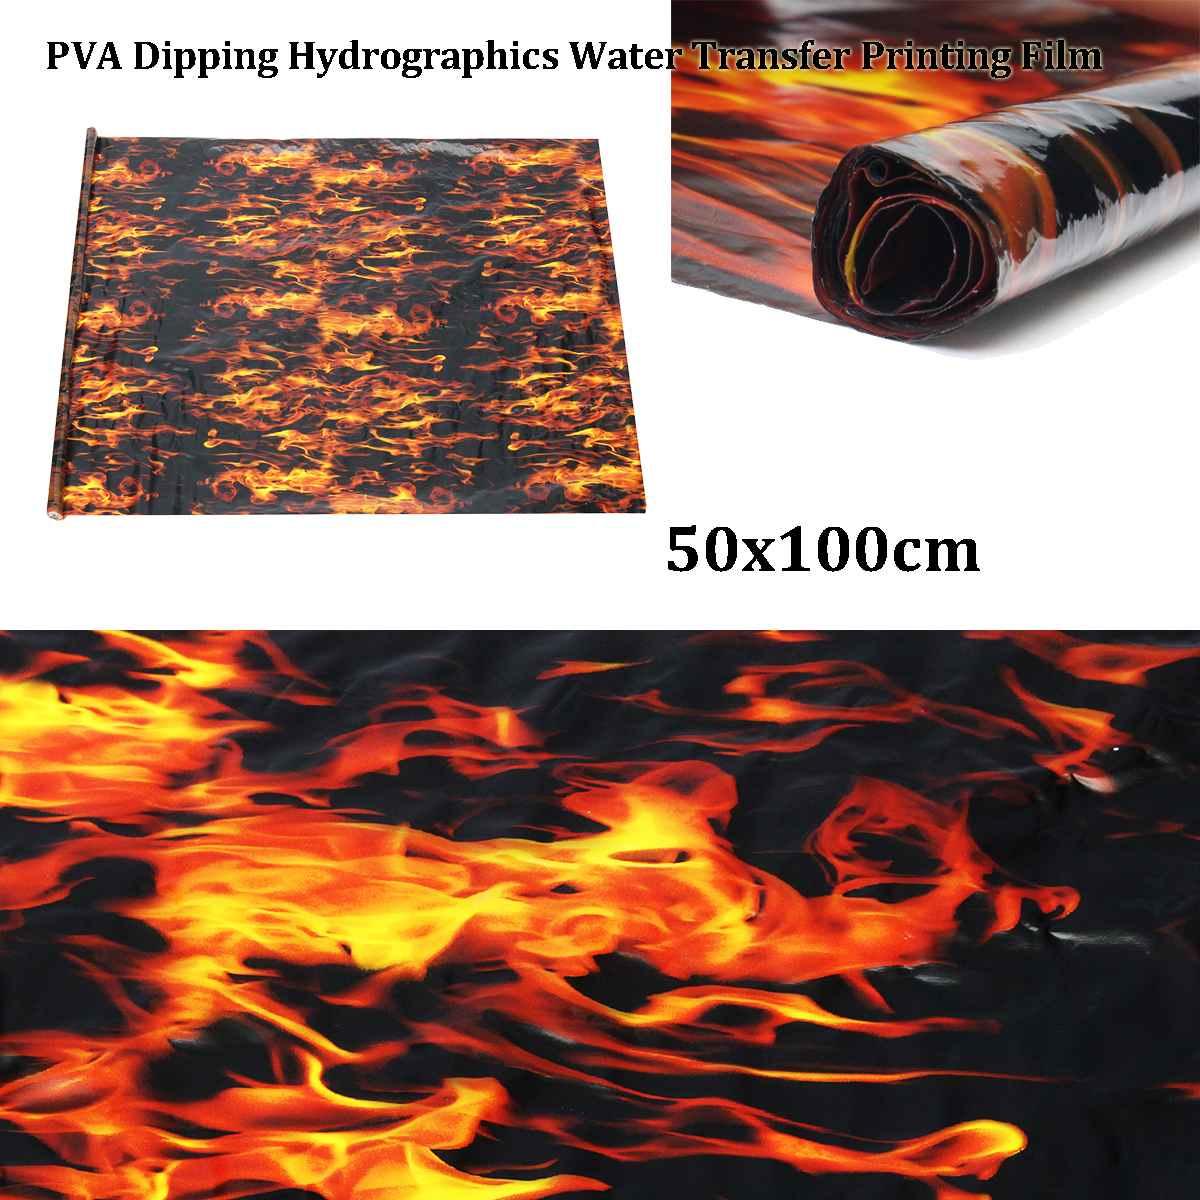 Película de transferencia de agua de 50x100cm diseño único impresión Hidrográfica de PVA